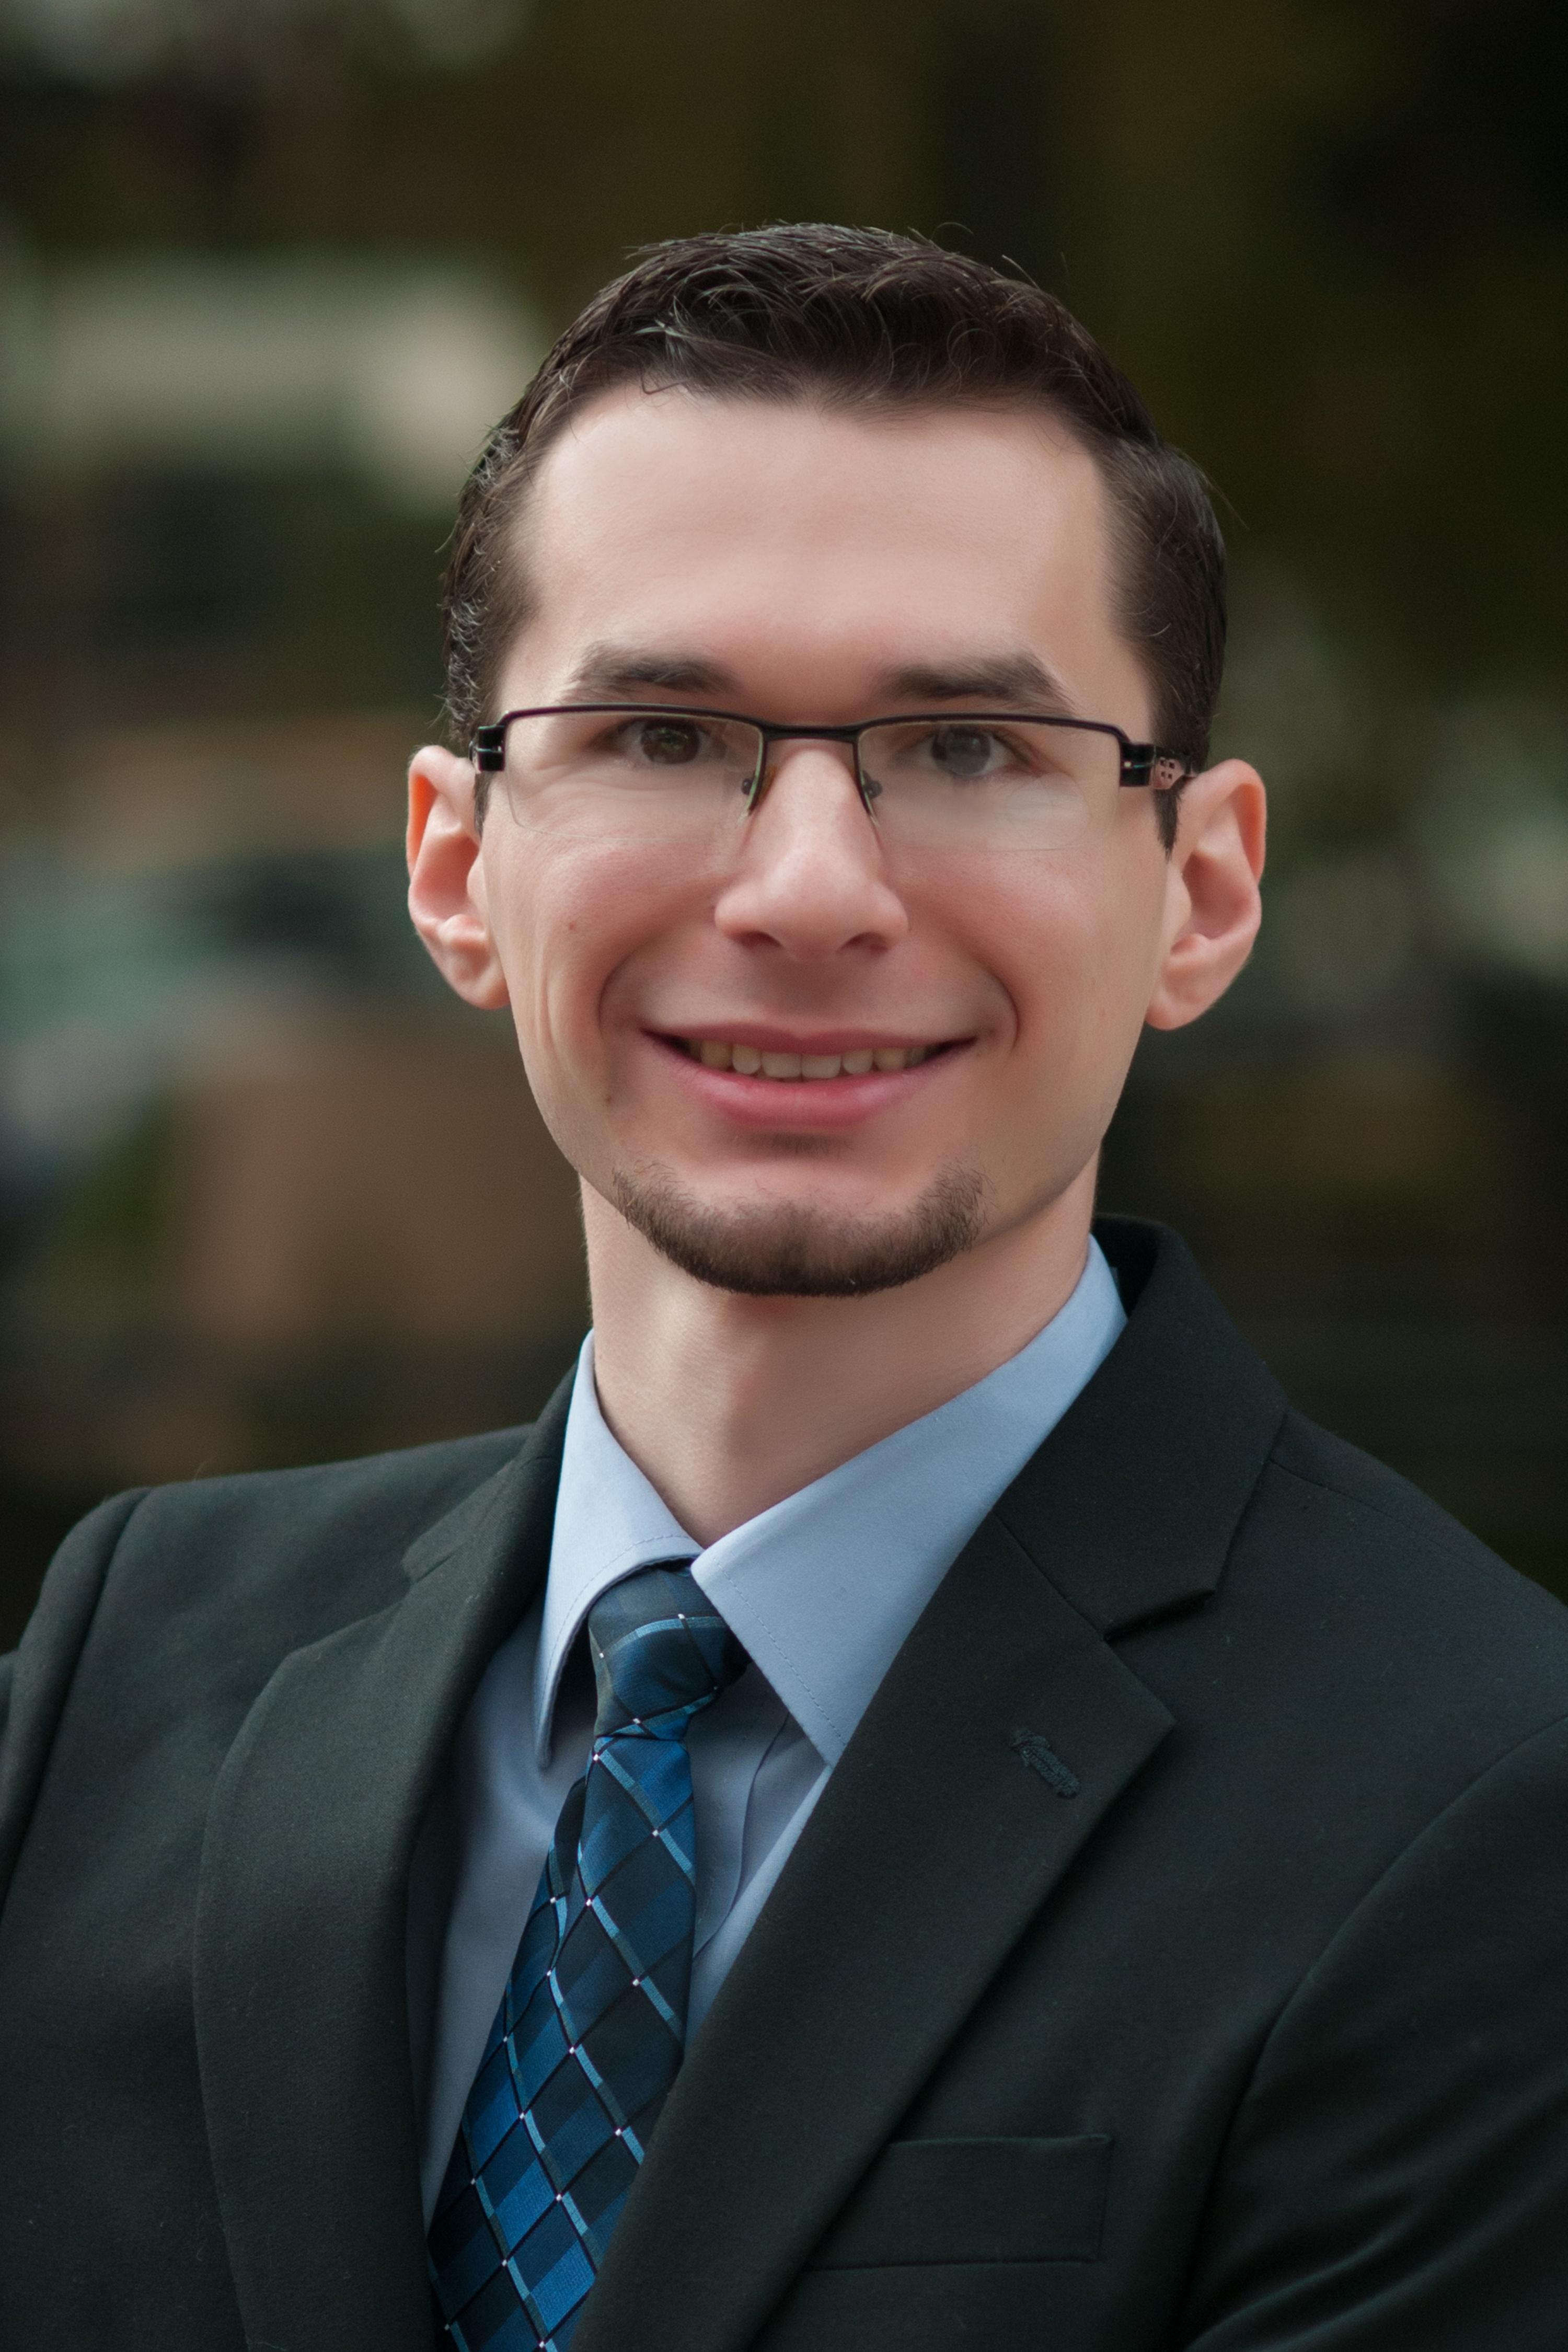 Jonathan Smeragliuolo